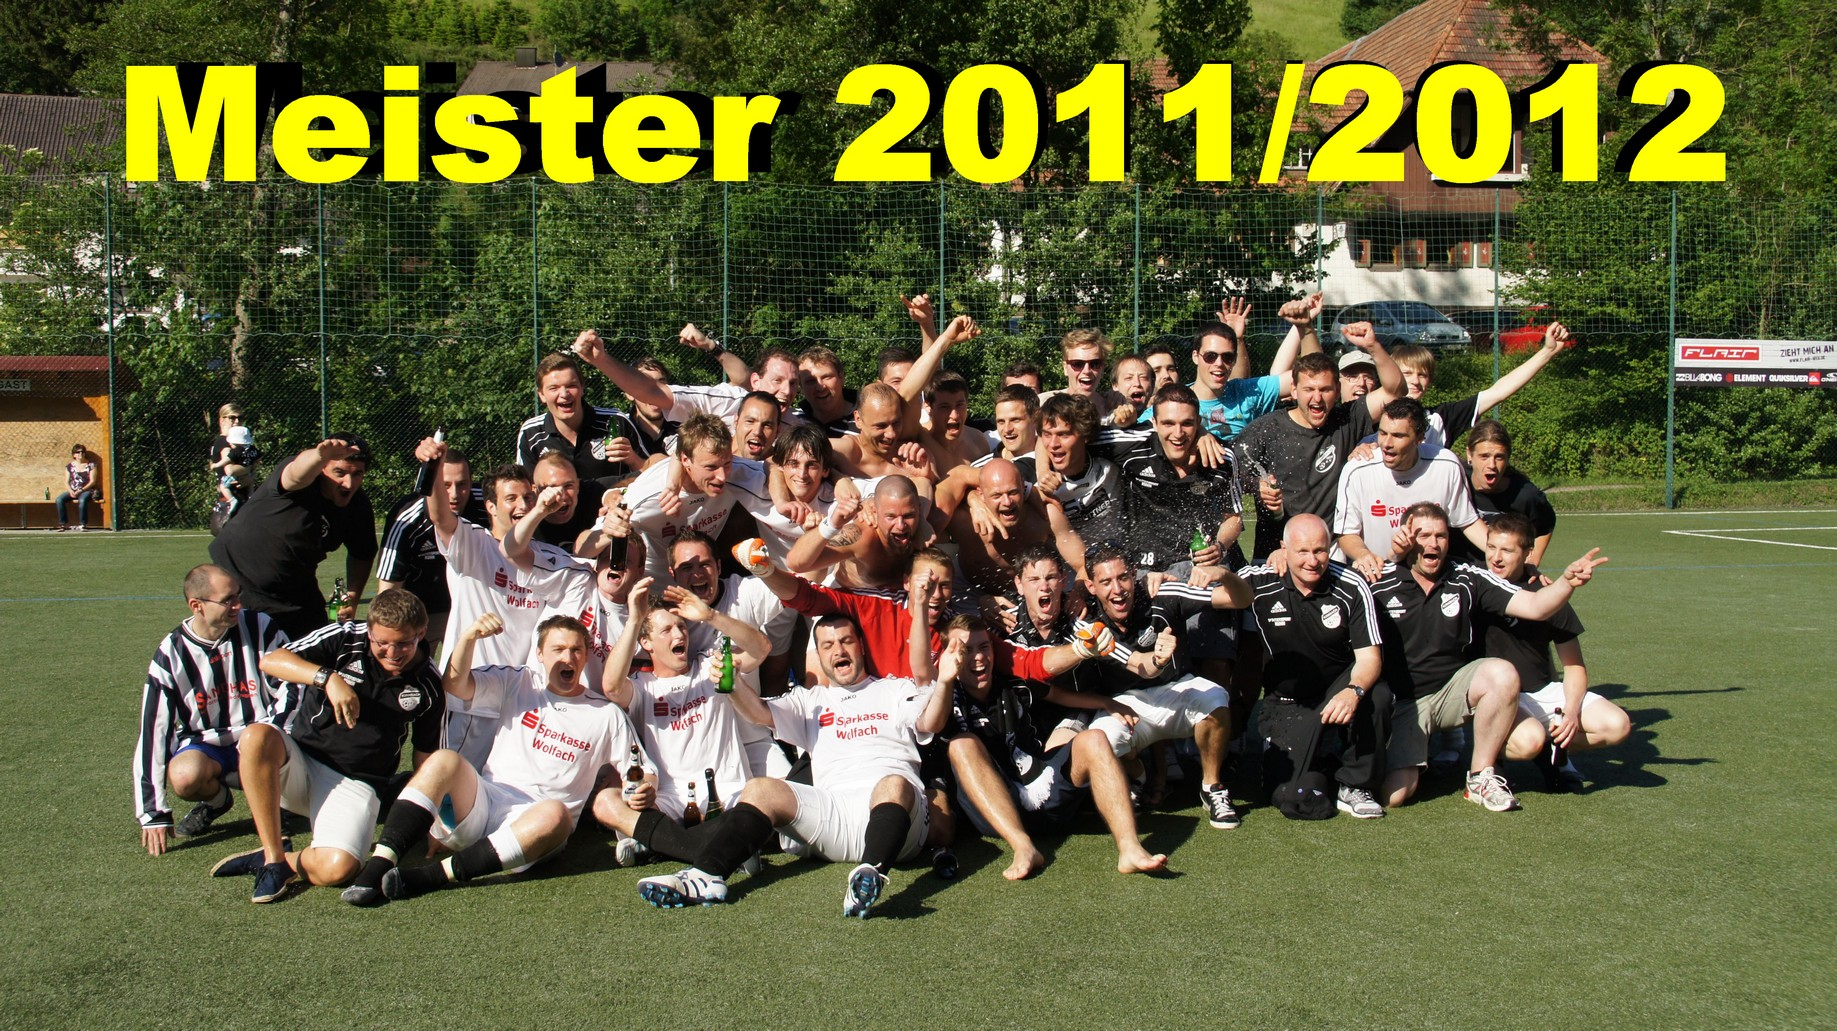 Meister 2011/12 der Kreisliga A Staffel Süd